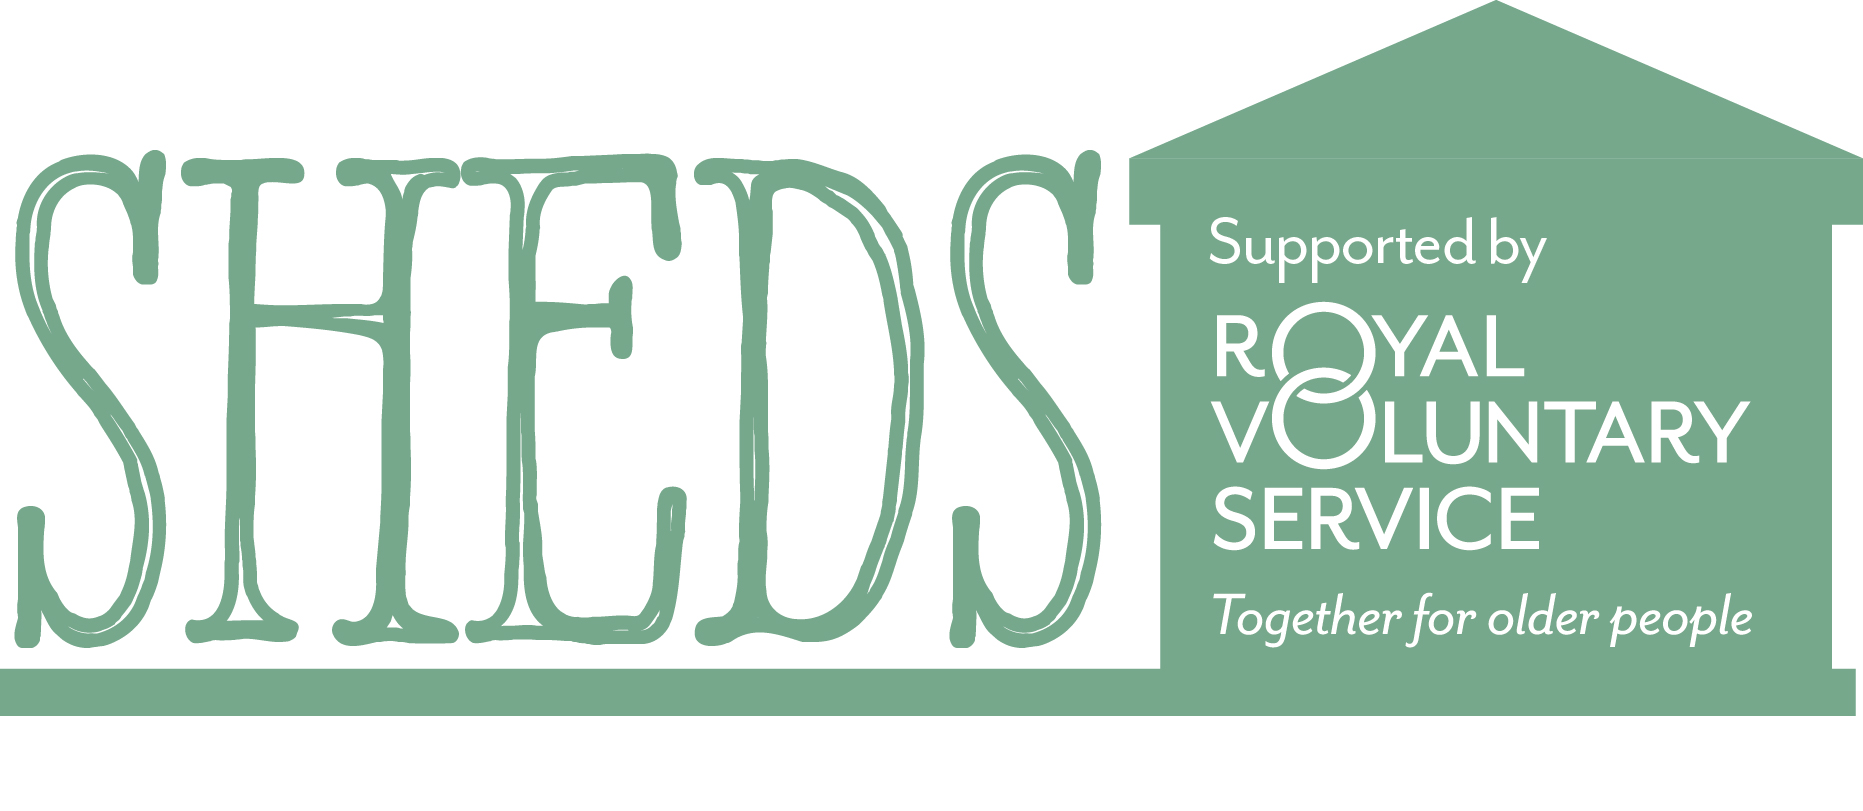 National Rvsasda Sheds Grant Fund Opens For Applications Scottish